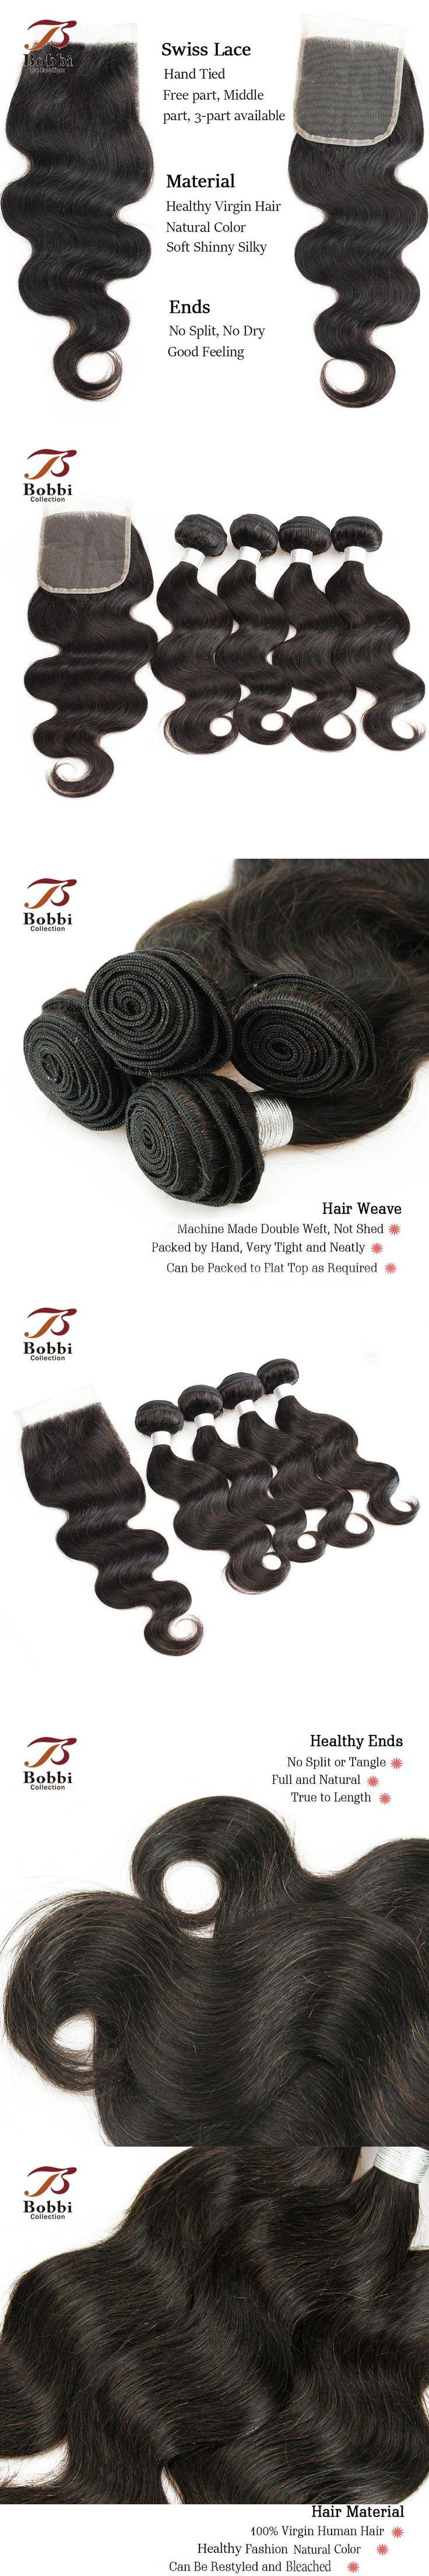 Brazilian Body Wave Hair Weave Bundles With Closure Brazilian Virgin Hair Extensions 4 Bundles Human Hair Weft BOBBI COLLECTION